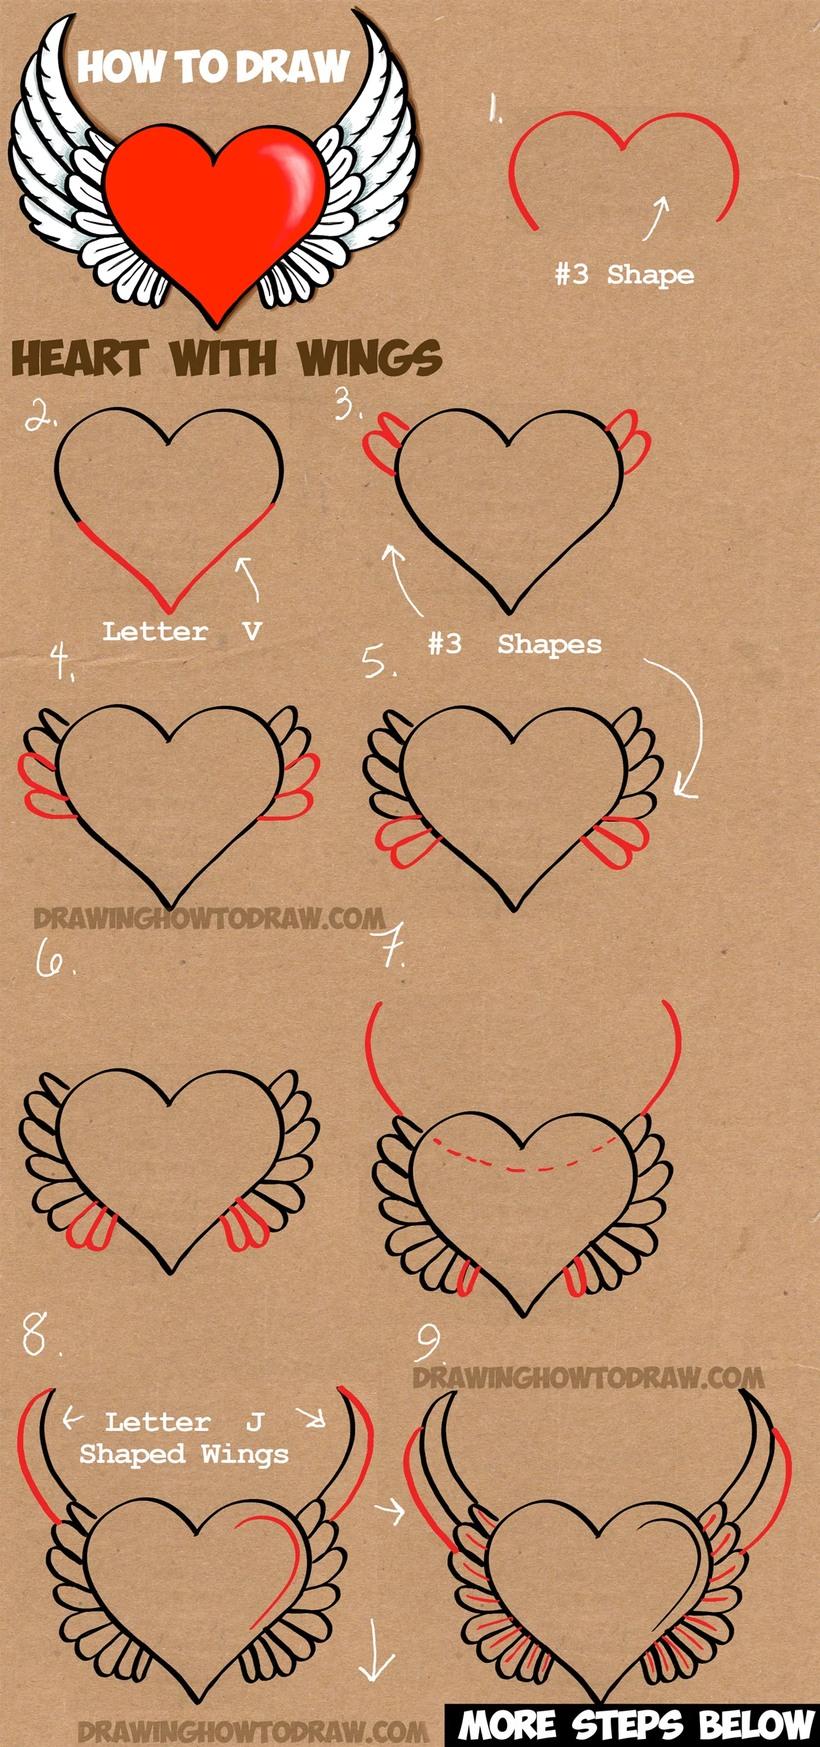 dibujos fáciles de corazon con alas alado a lápiz paso a paso